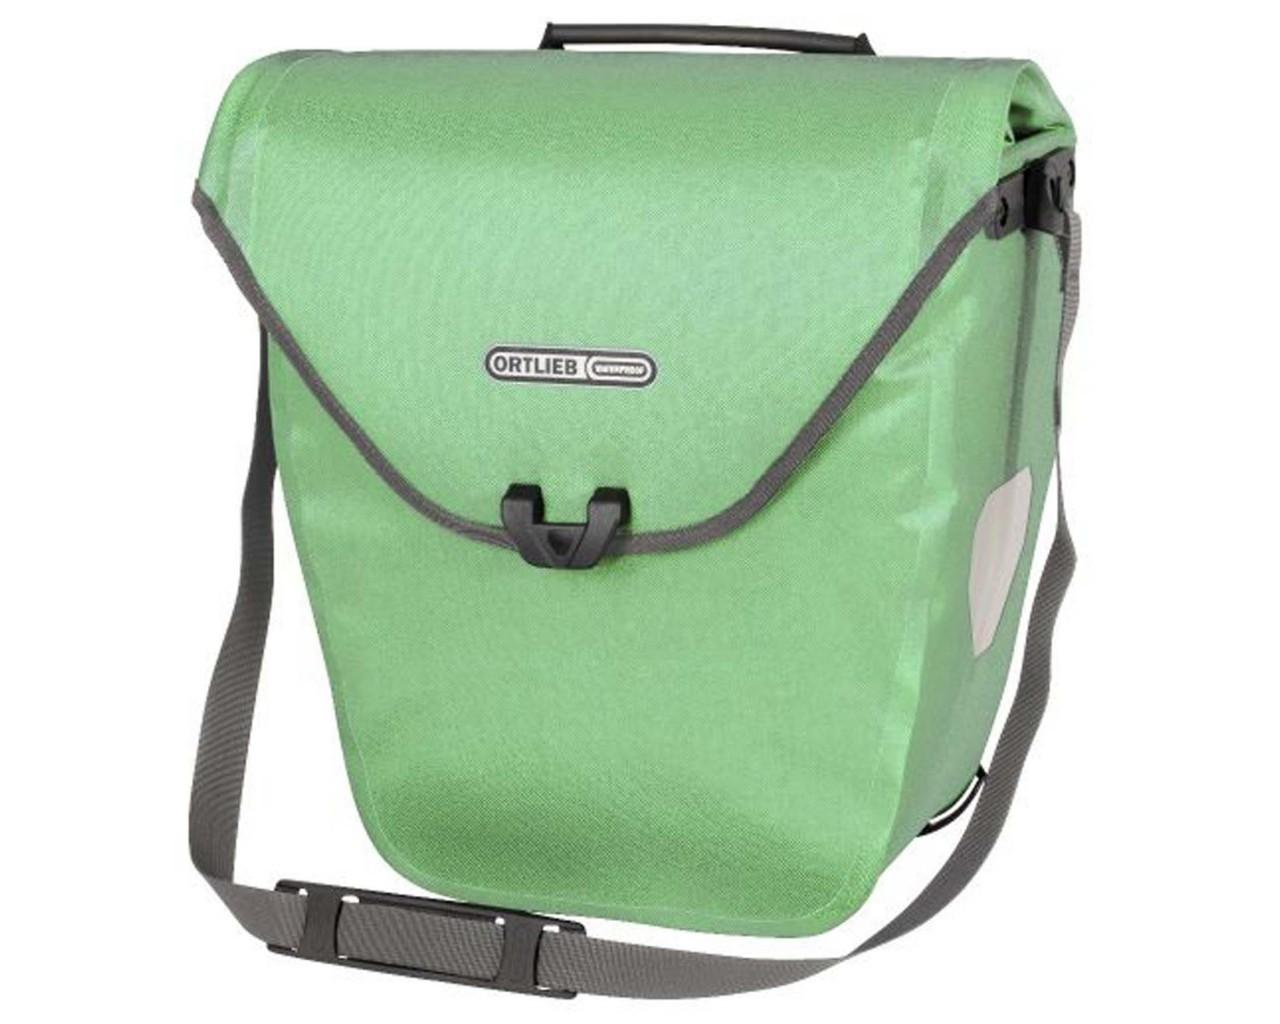 Ortlieb Velo-Shopper 18 litres QL2.1 waterproof Bicycle bag (single bag) PVC free   pistacchio